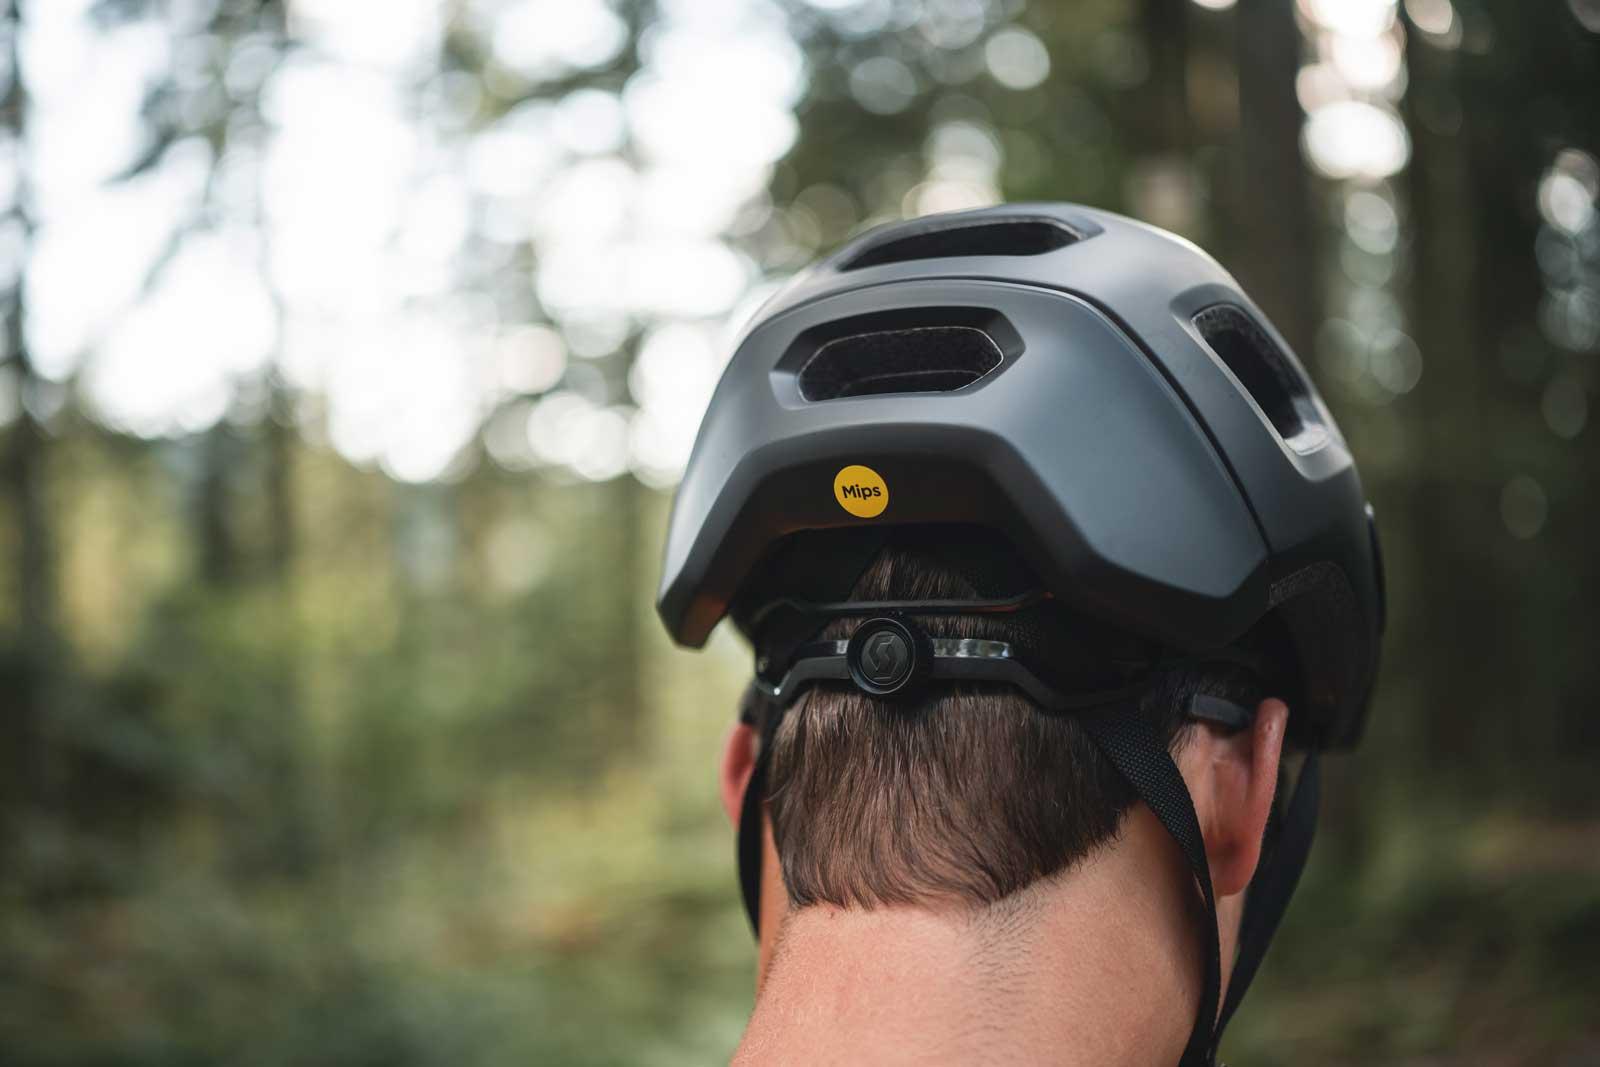 All-New SCOTT Argo Plus offers a full featured trail helmet under budget thumbnail